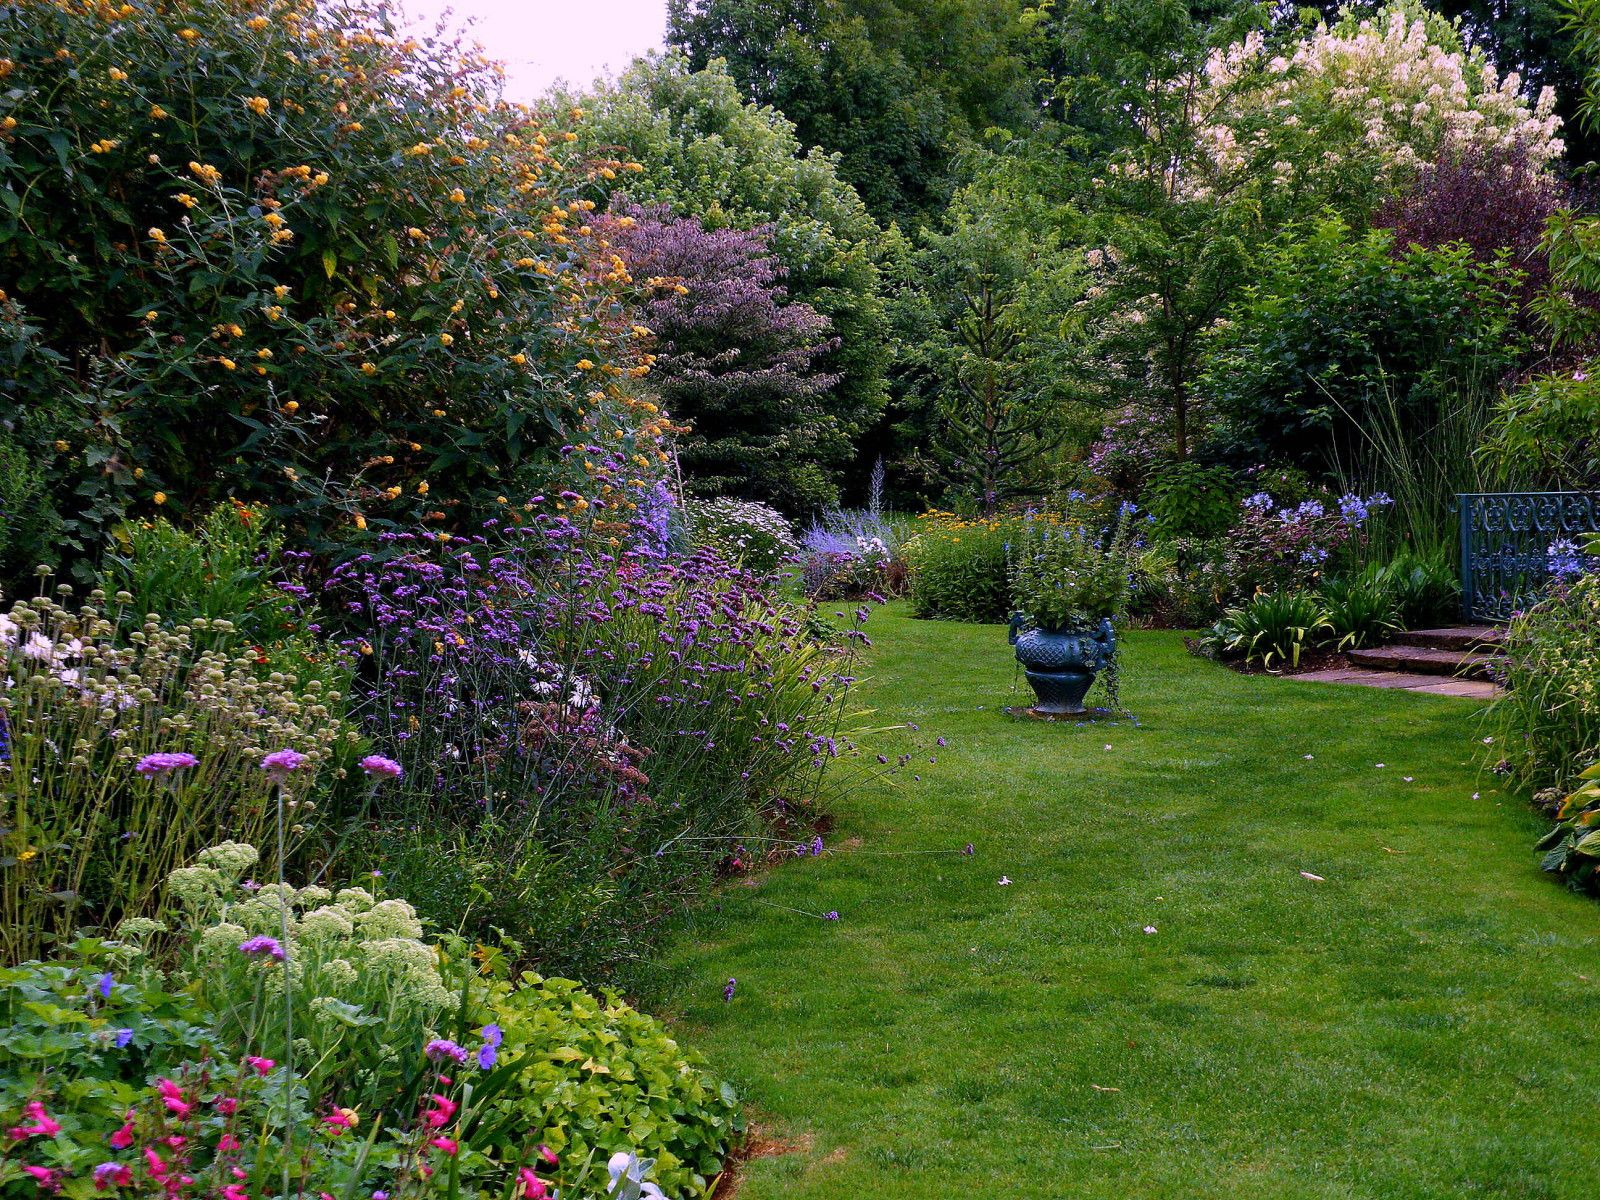 Jardin l 39 anglaise plan recherche google jardin for Plan amenagement jardin anglais